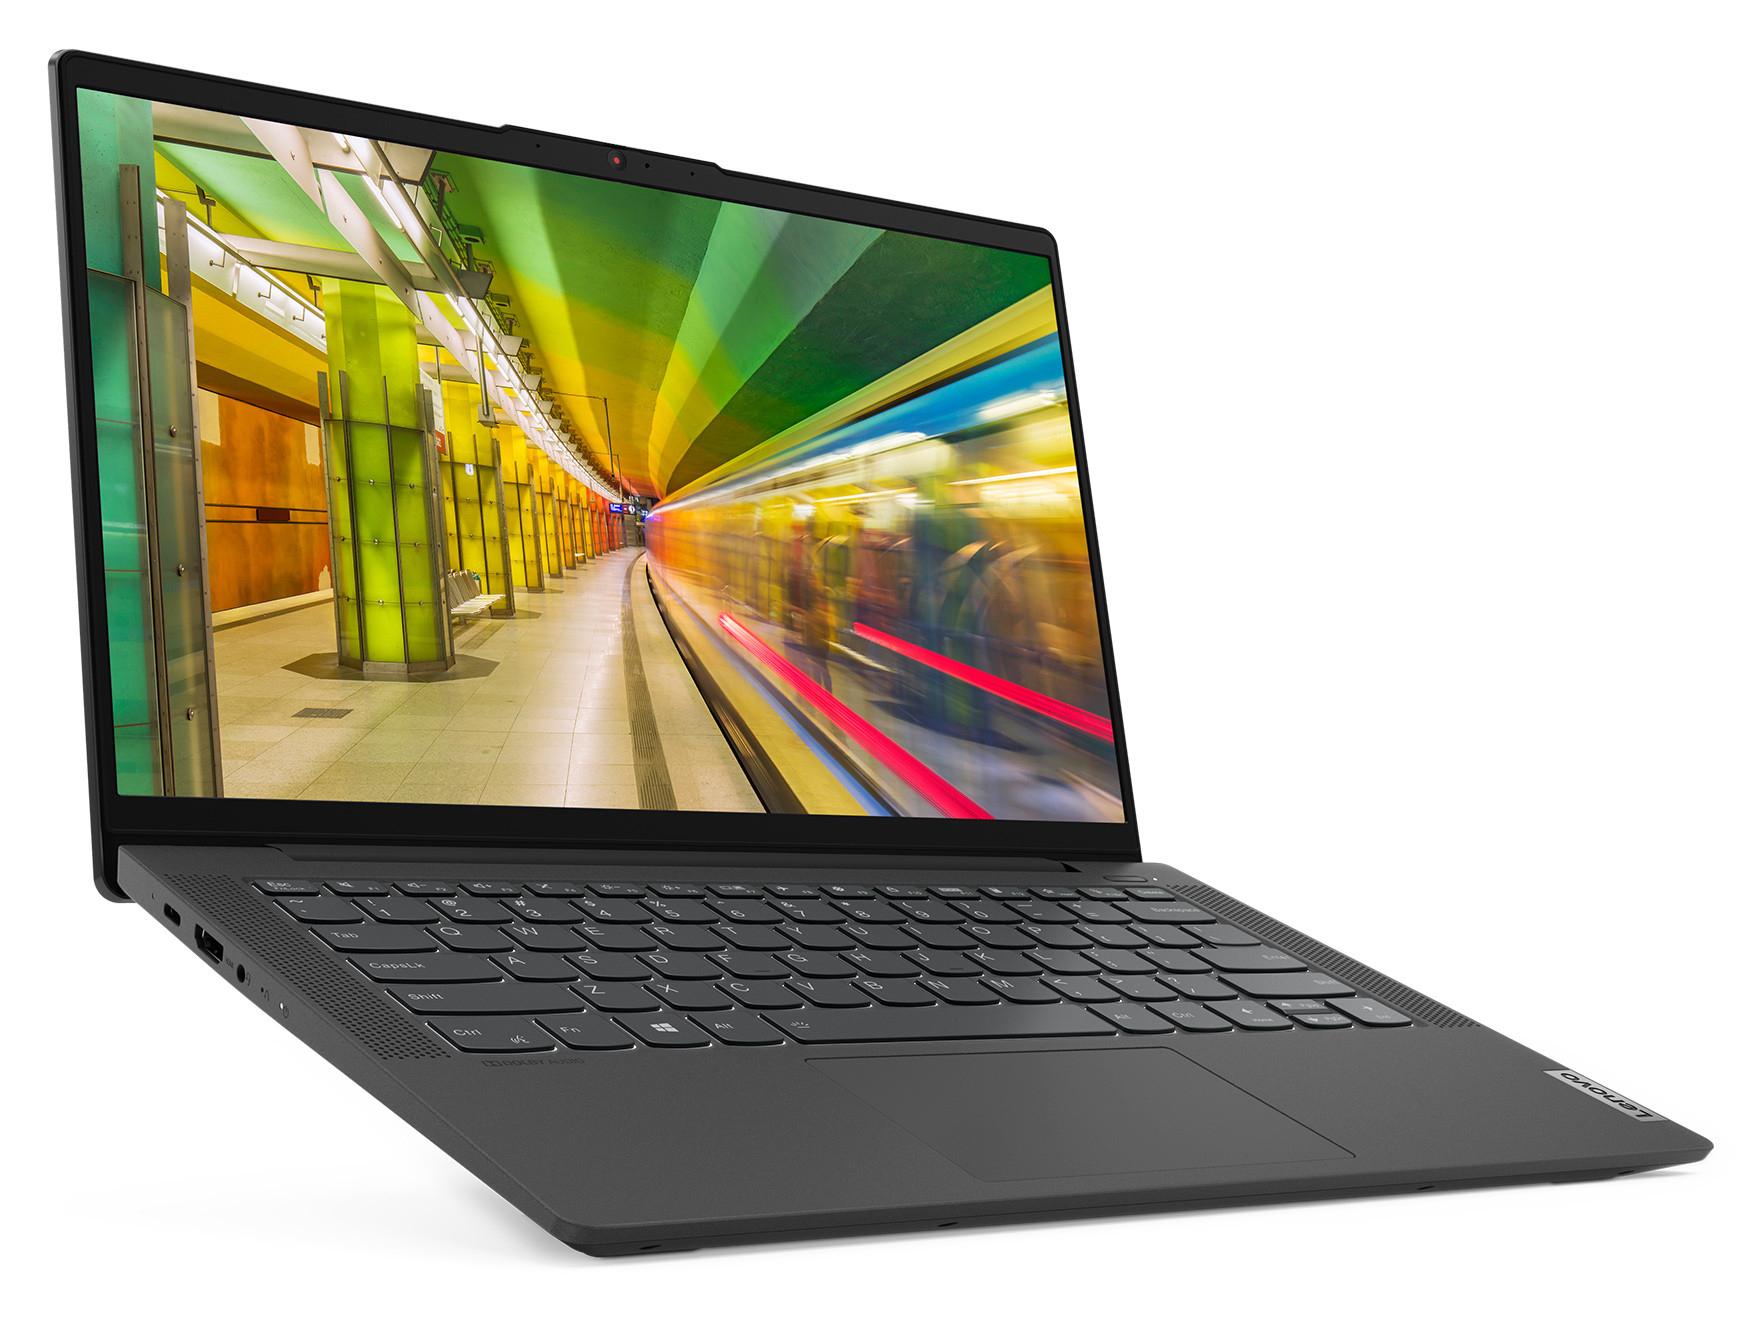 "[Studenten] Lenovo IdeaPad 5 (14"", FHD, IPS, 300cd/m², i5-1035G, 8/512GB, MX350 2GB, USB-C + DP & PD, HDMI 1.4, 57Wh, Win10, 1.38kg)"